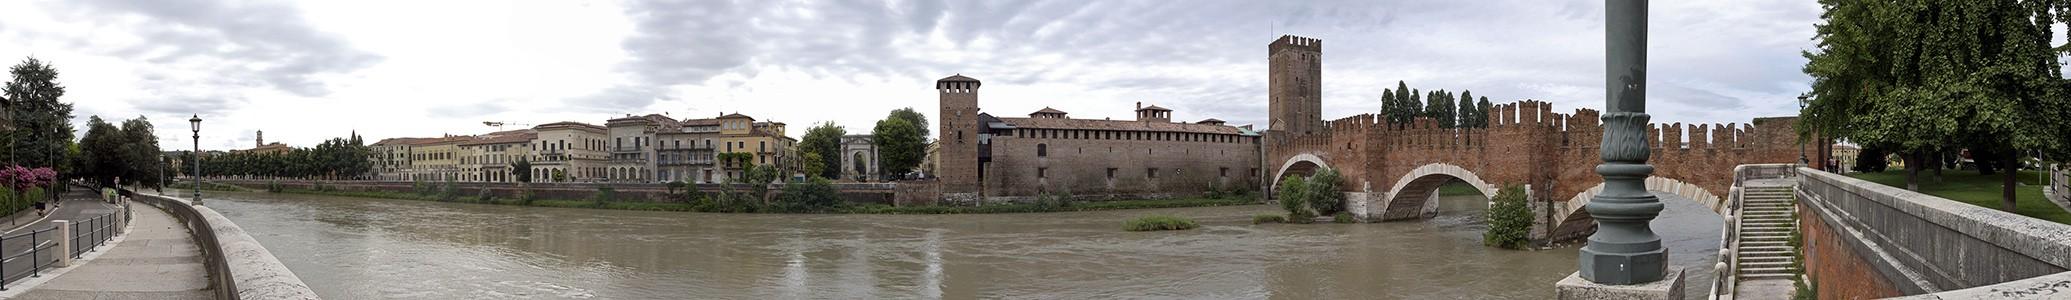 Centro Storico (Altstadt): Etsch (Adige), Castelvecchio, Ponte Scaligero (Skaligerbrücke) Verona